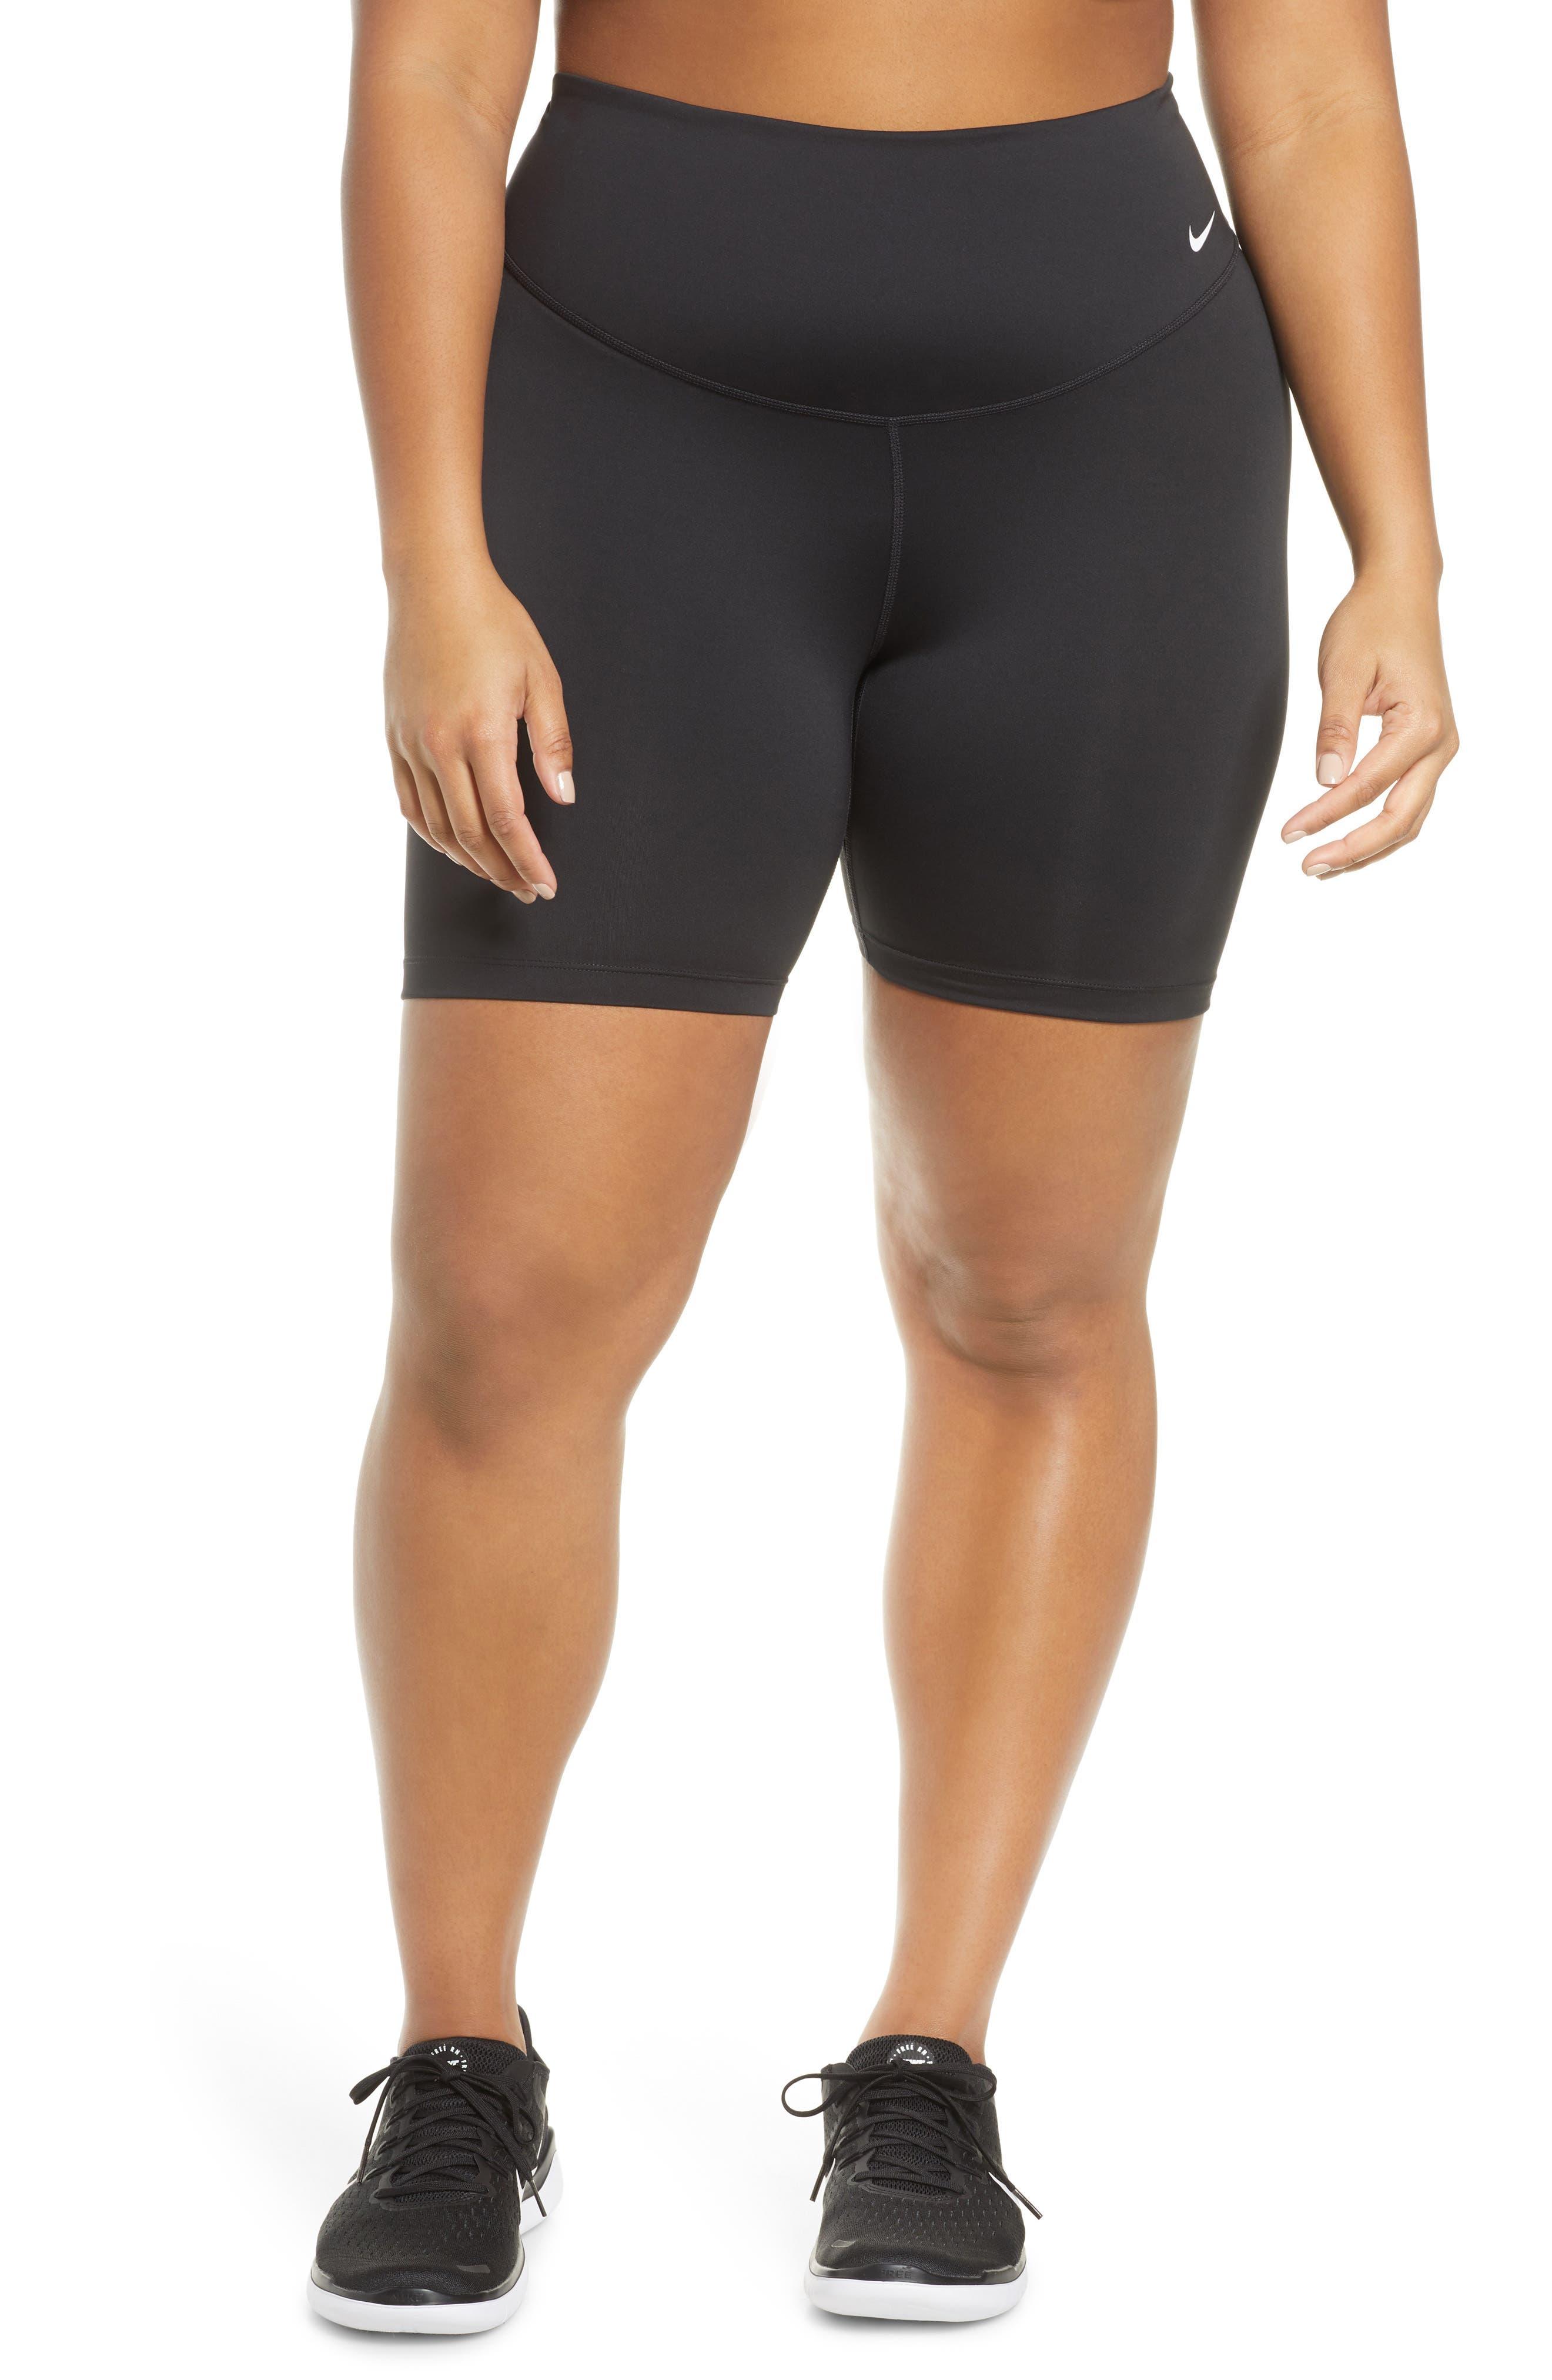 Plus Women's Nike One Dri-Fit Shorts